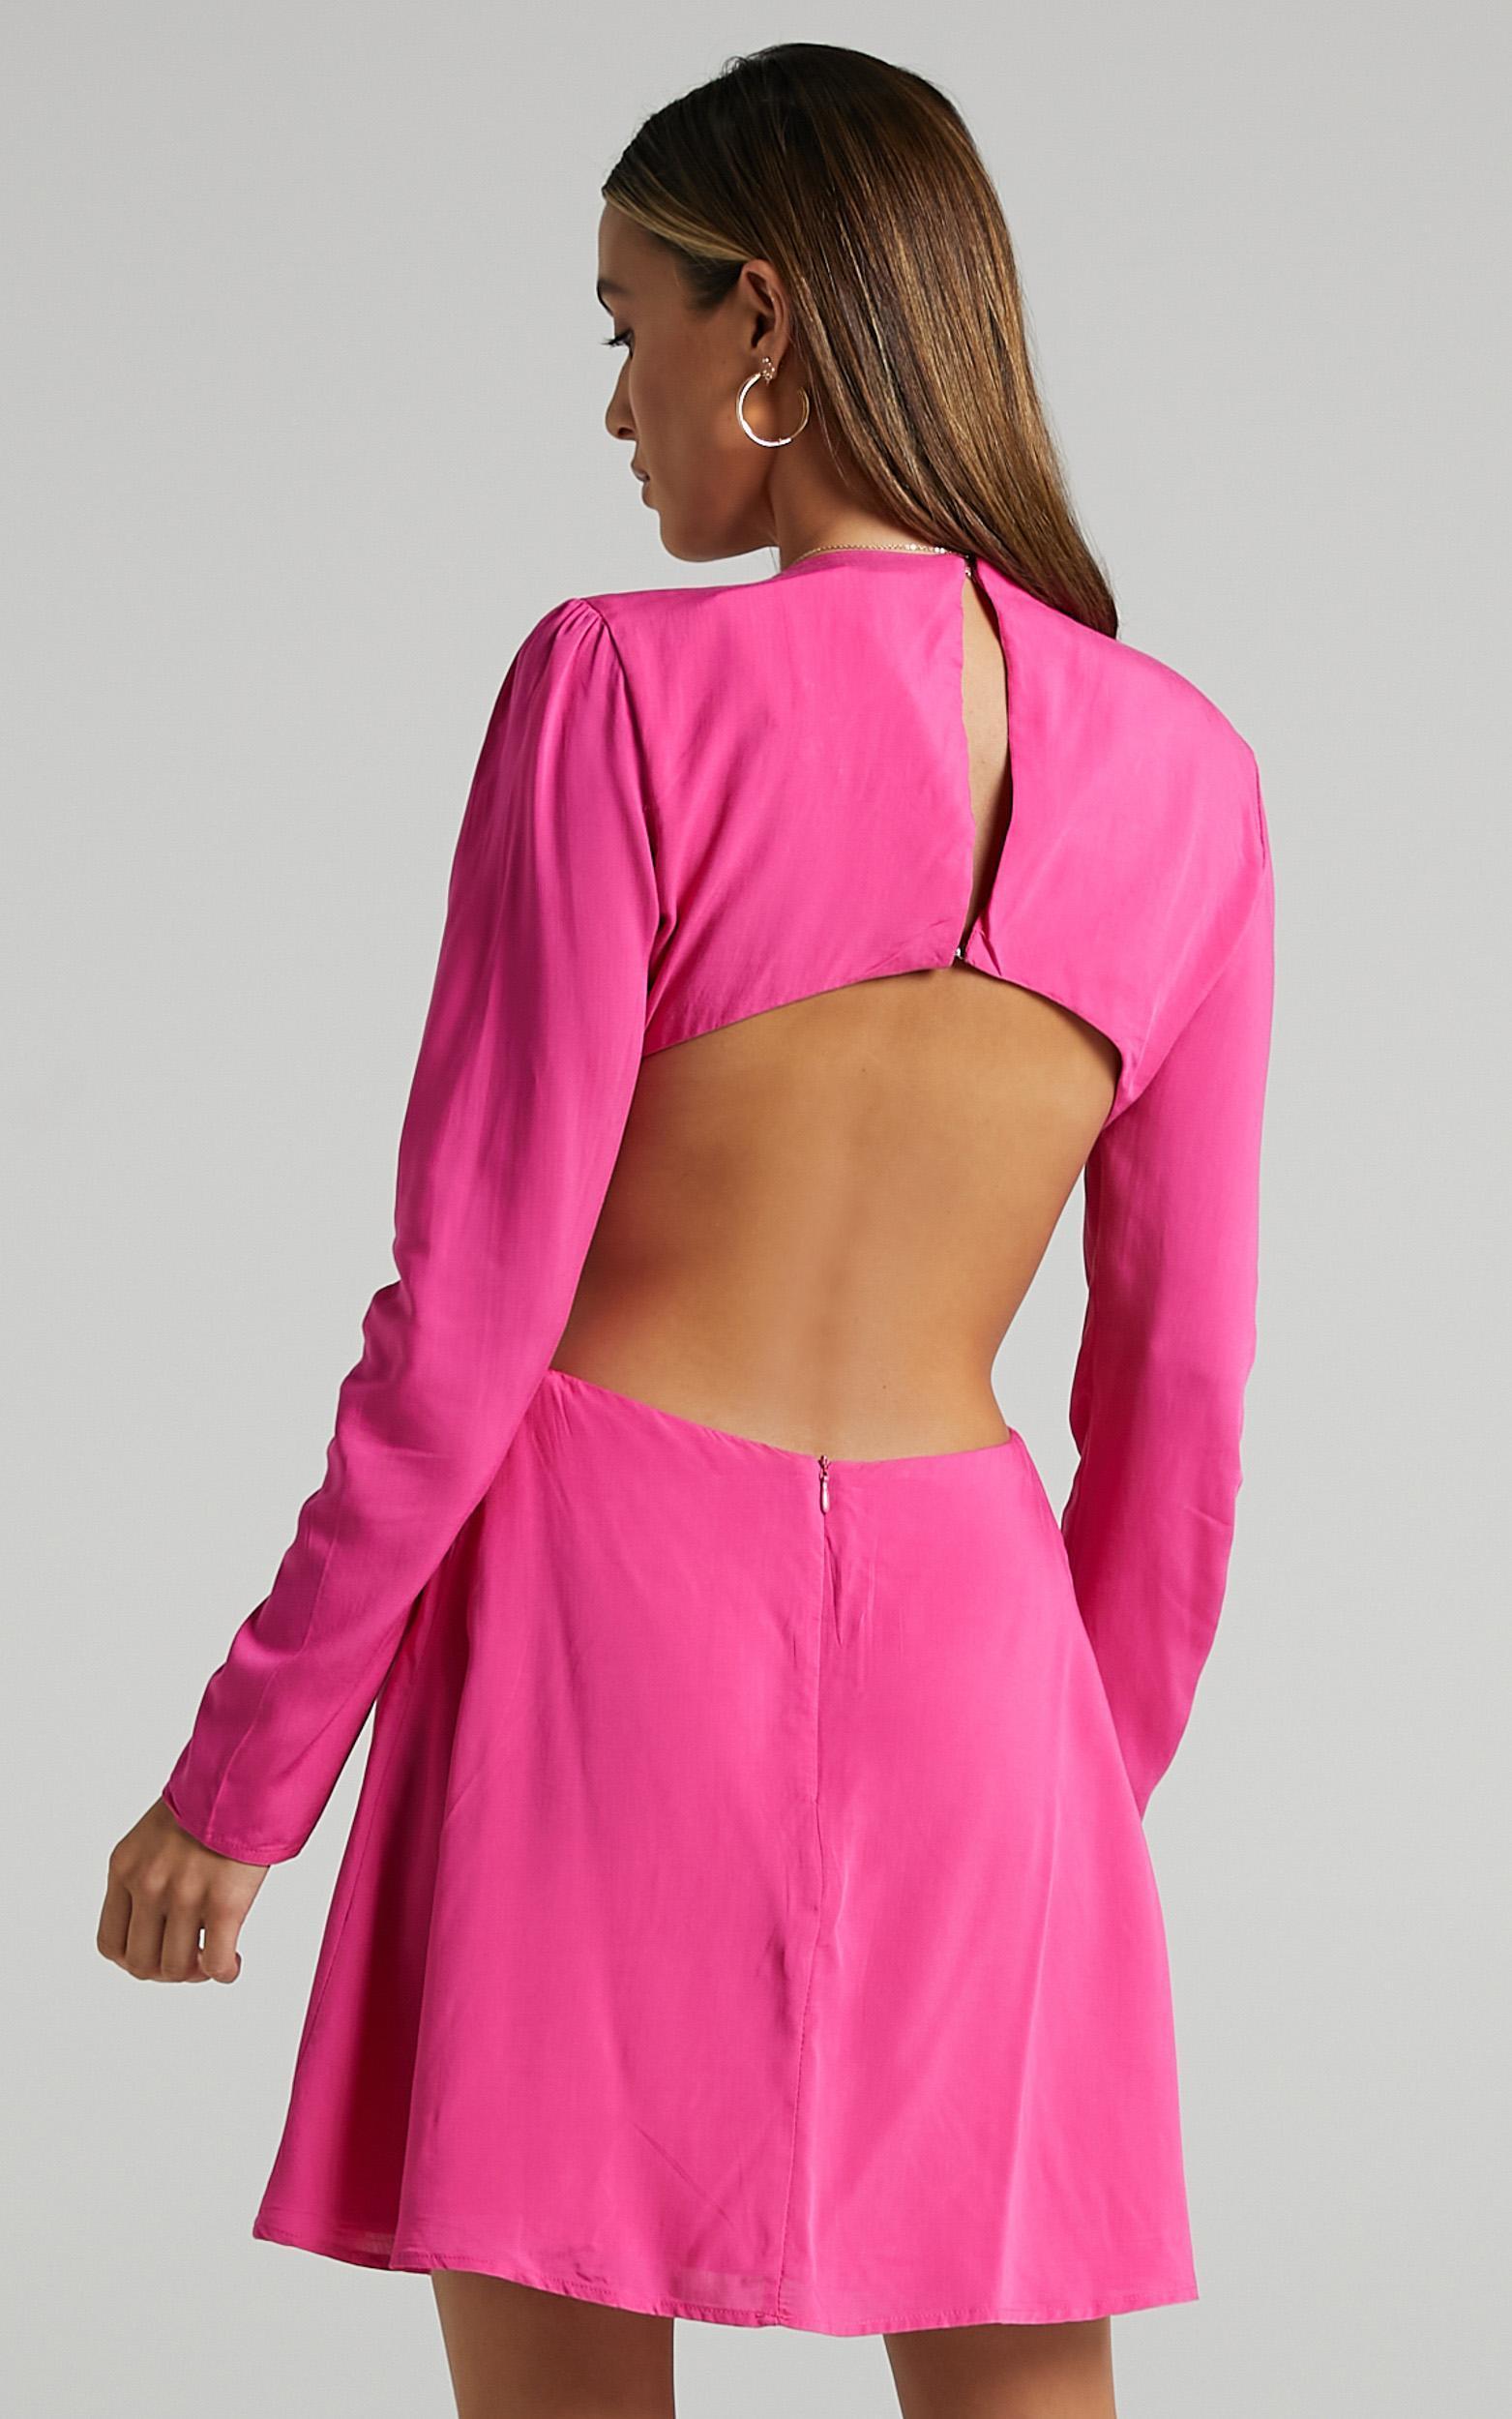 Ripon Dress in Hot Pink - 6 (XS), PNK11, hi-res image number null